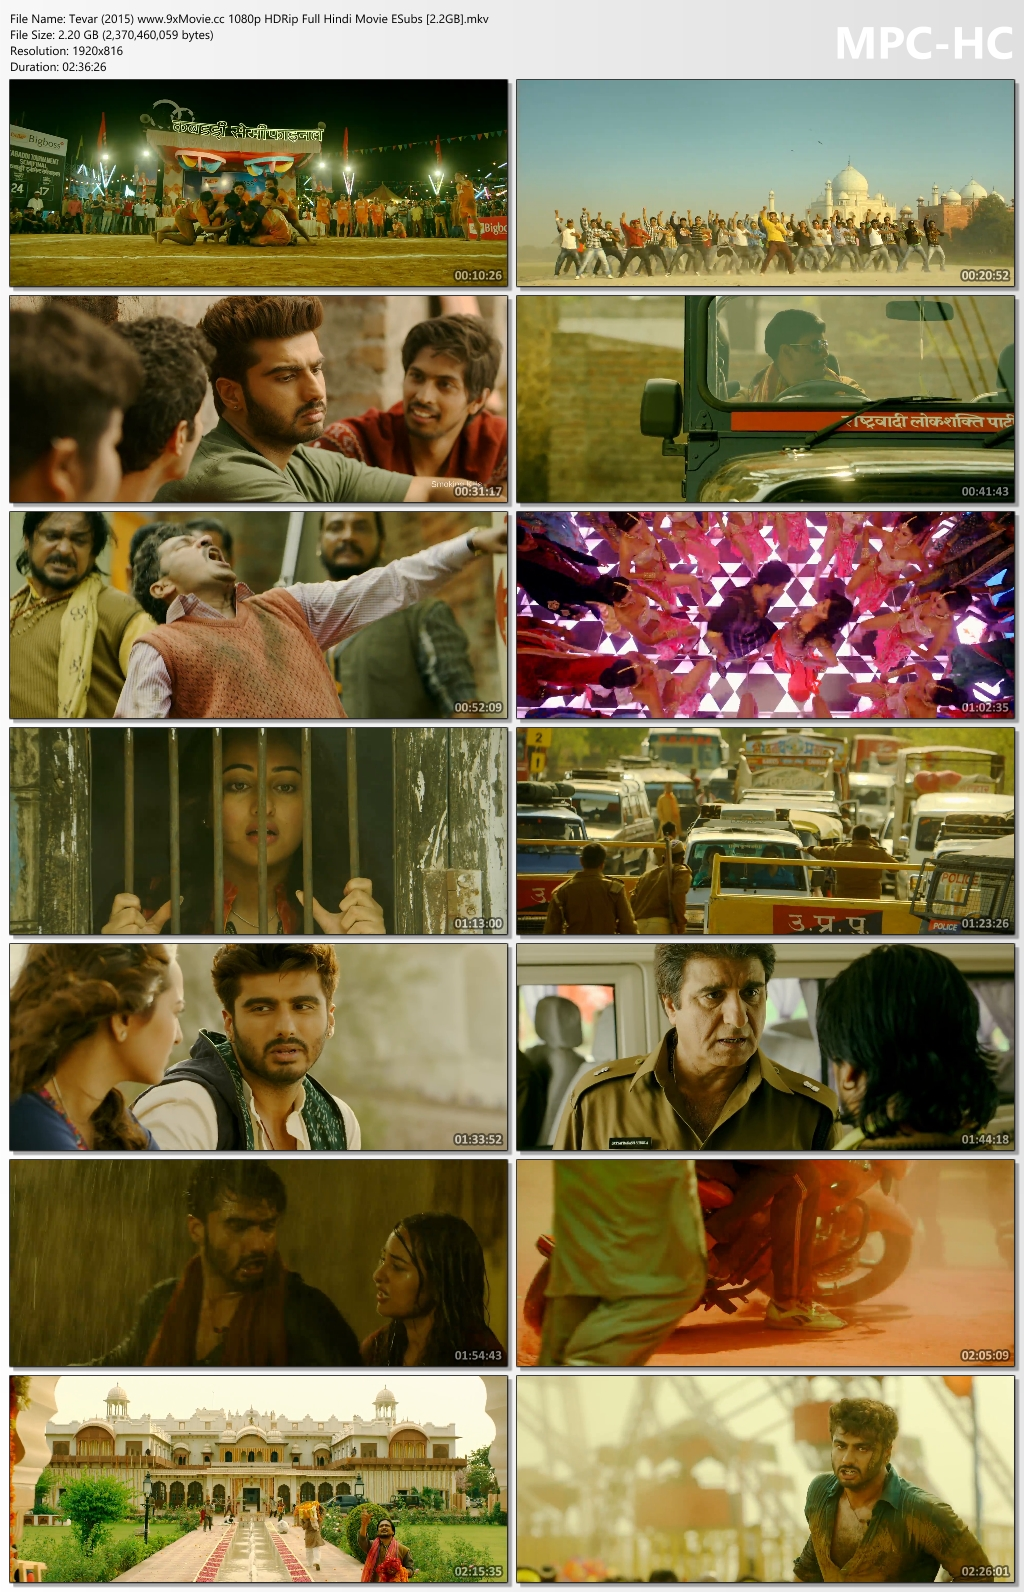 Tevar-2015-www-9x-Movie-cc-1080p-HDRip-Full-Hindi-Movie-ESubs-2-2-GB-mkv